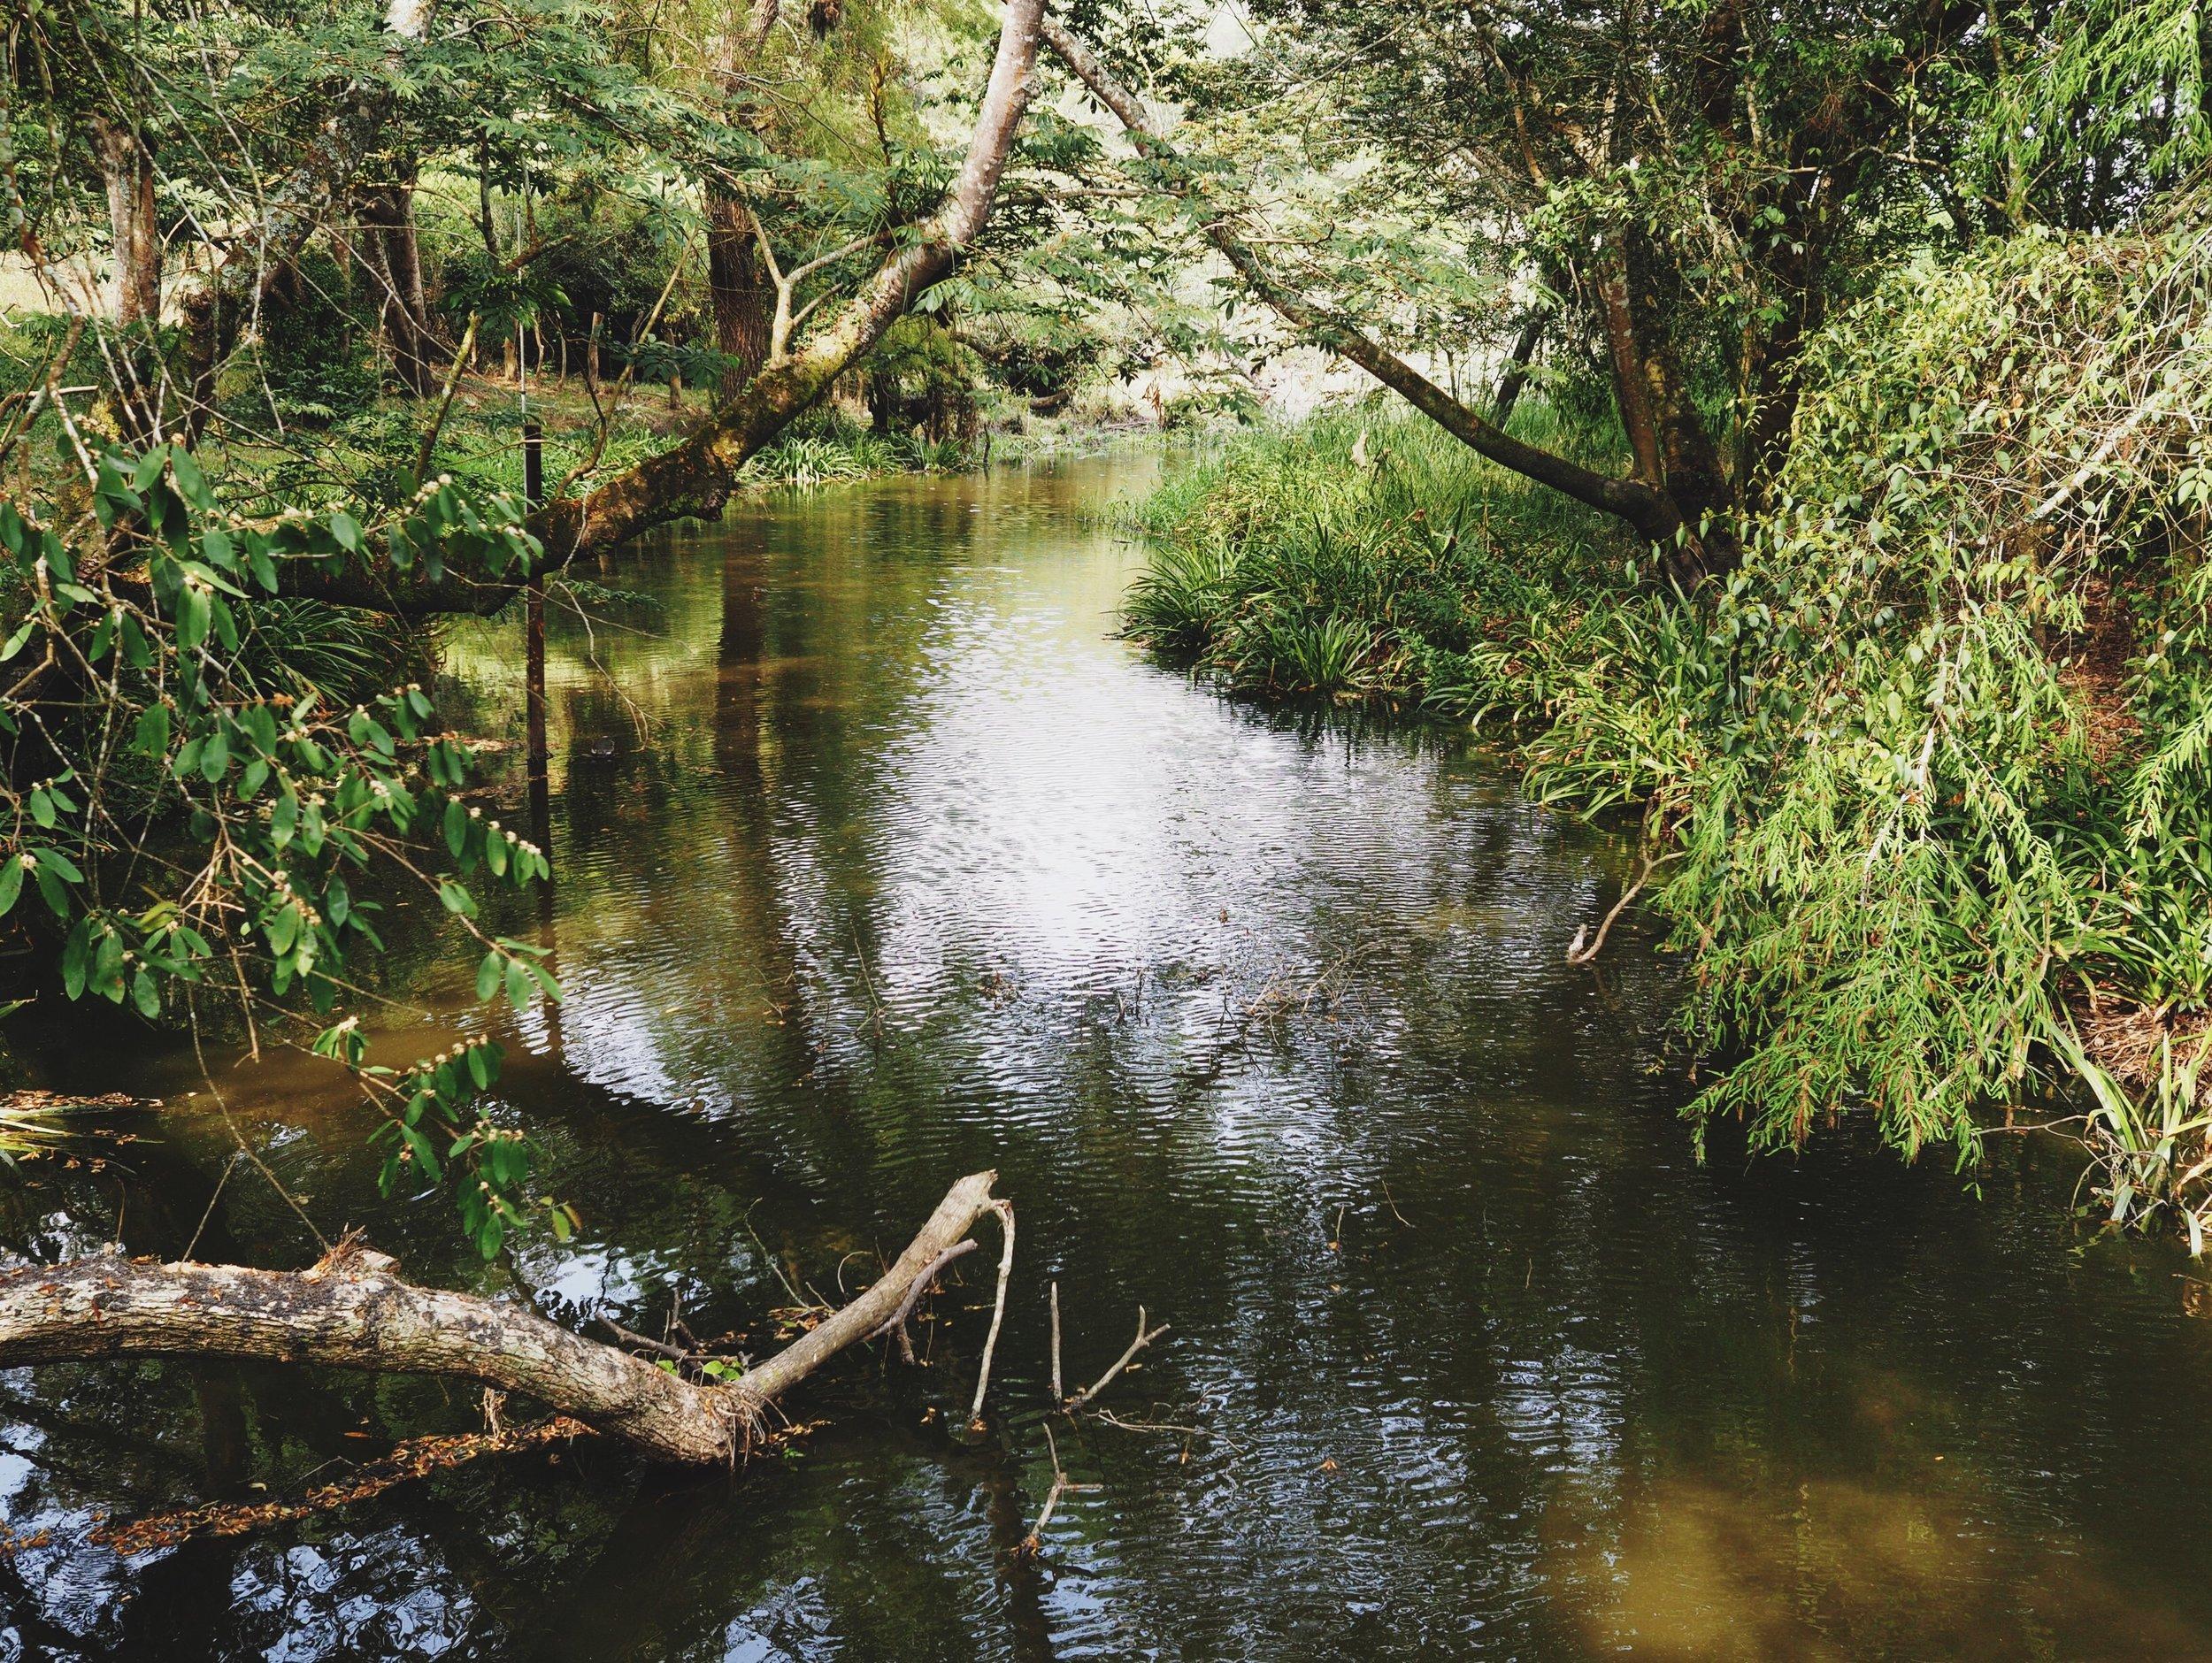 River running through the park